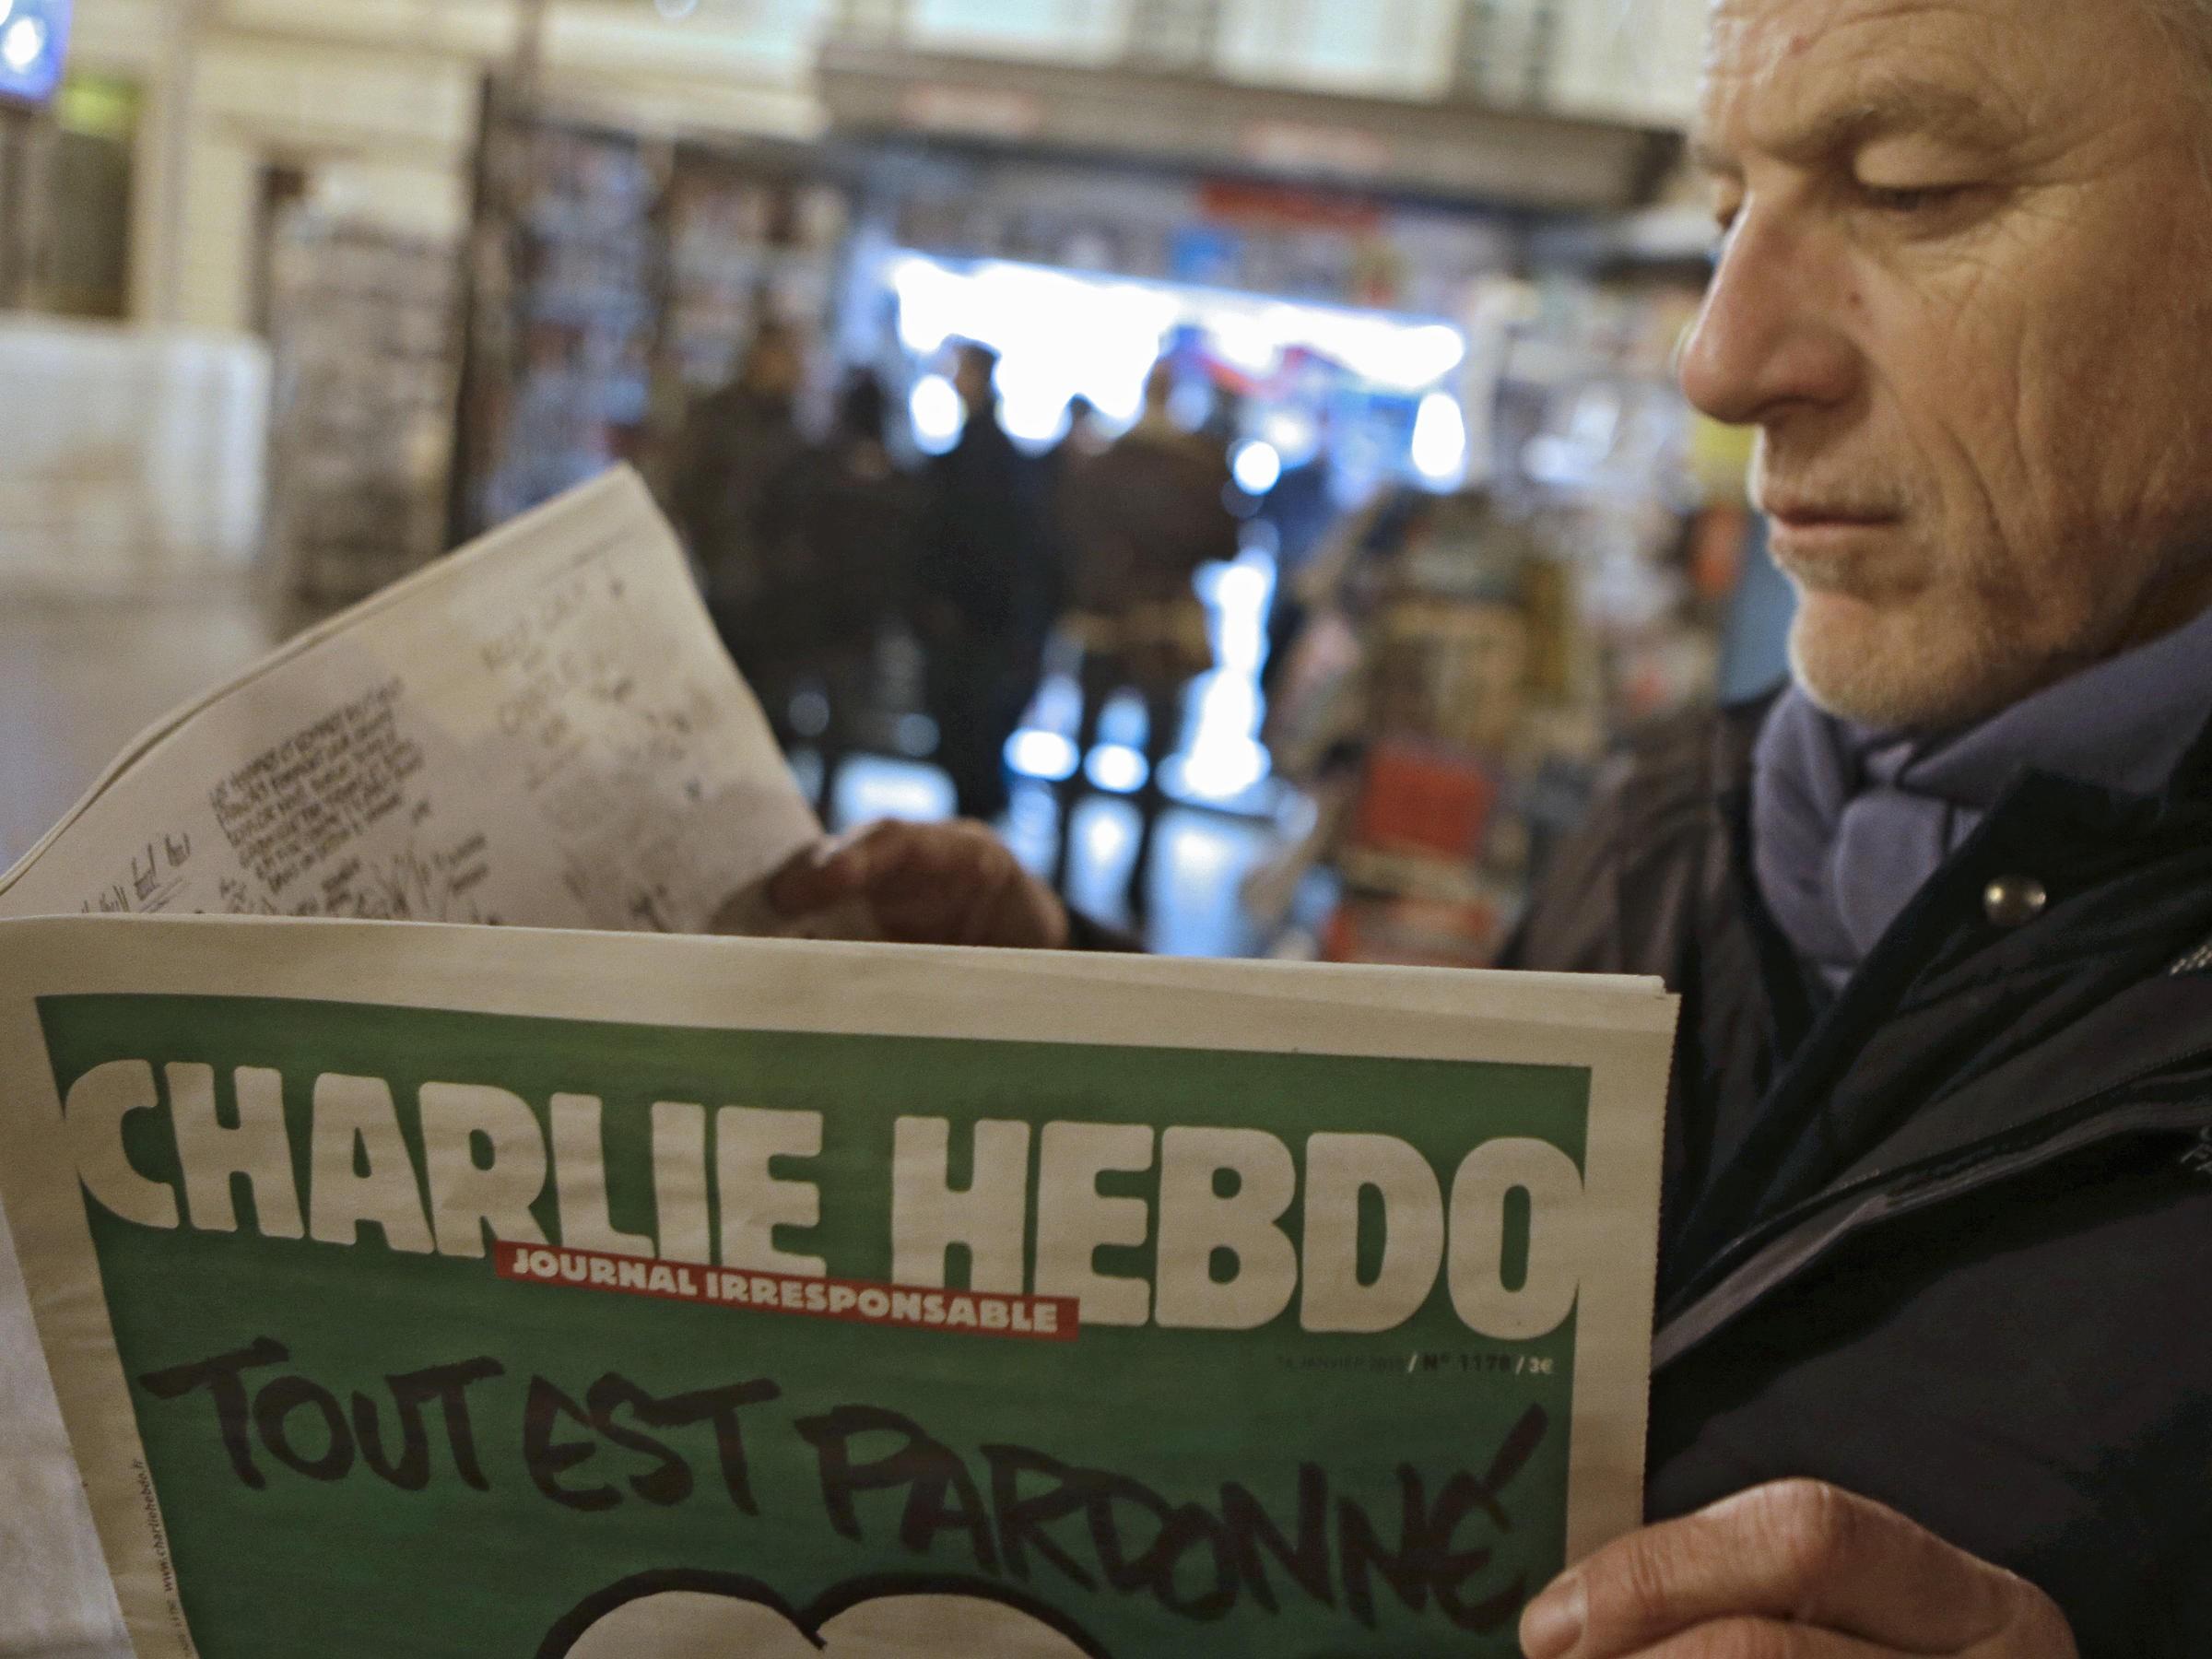 Сатирическому журналу Charlie Hebdo угрожают из-за рисунка голых мусульман